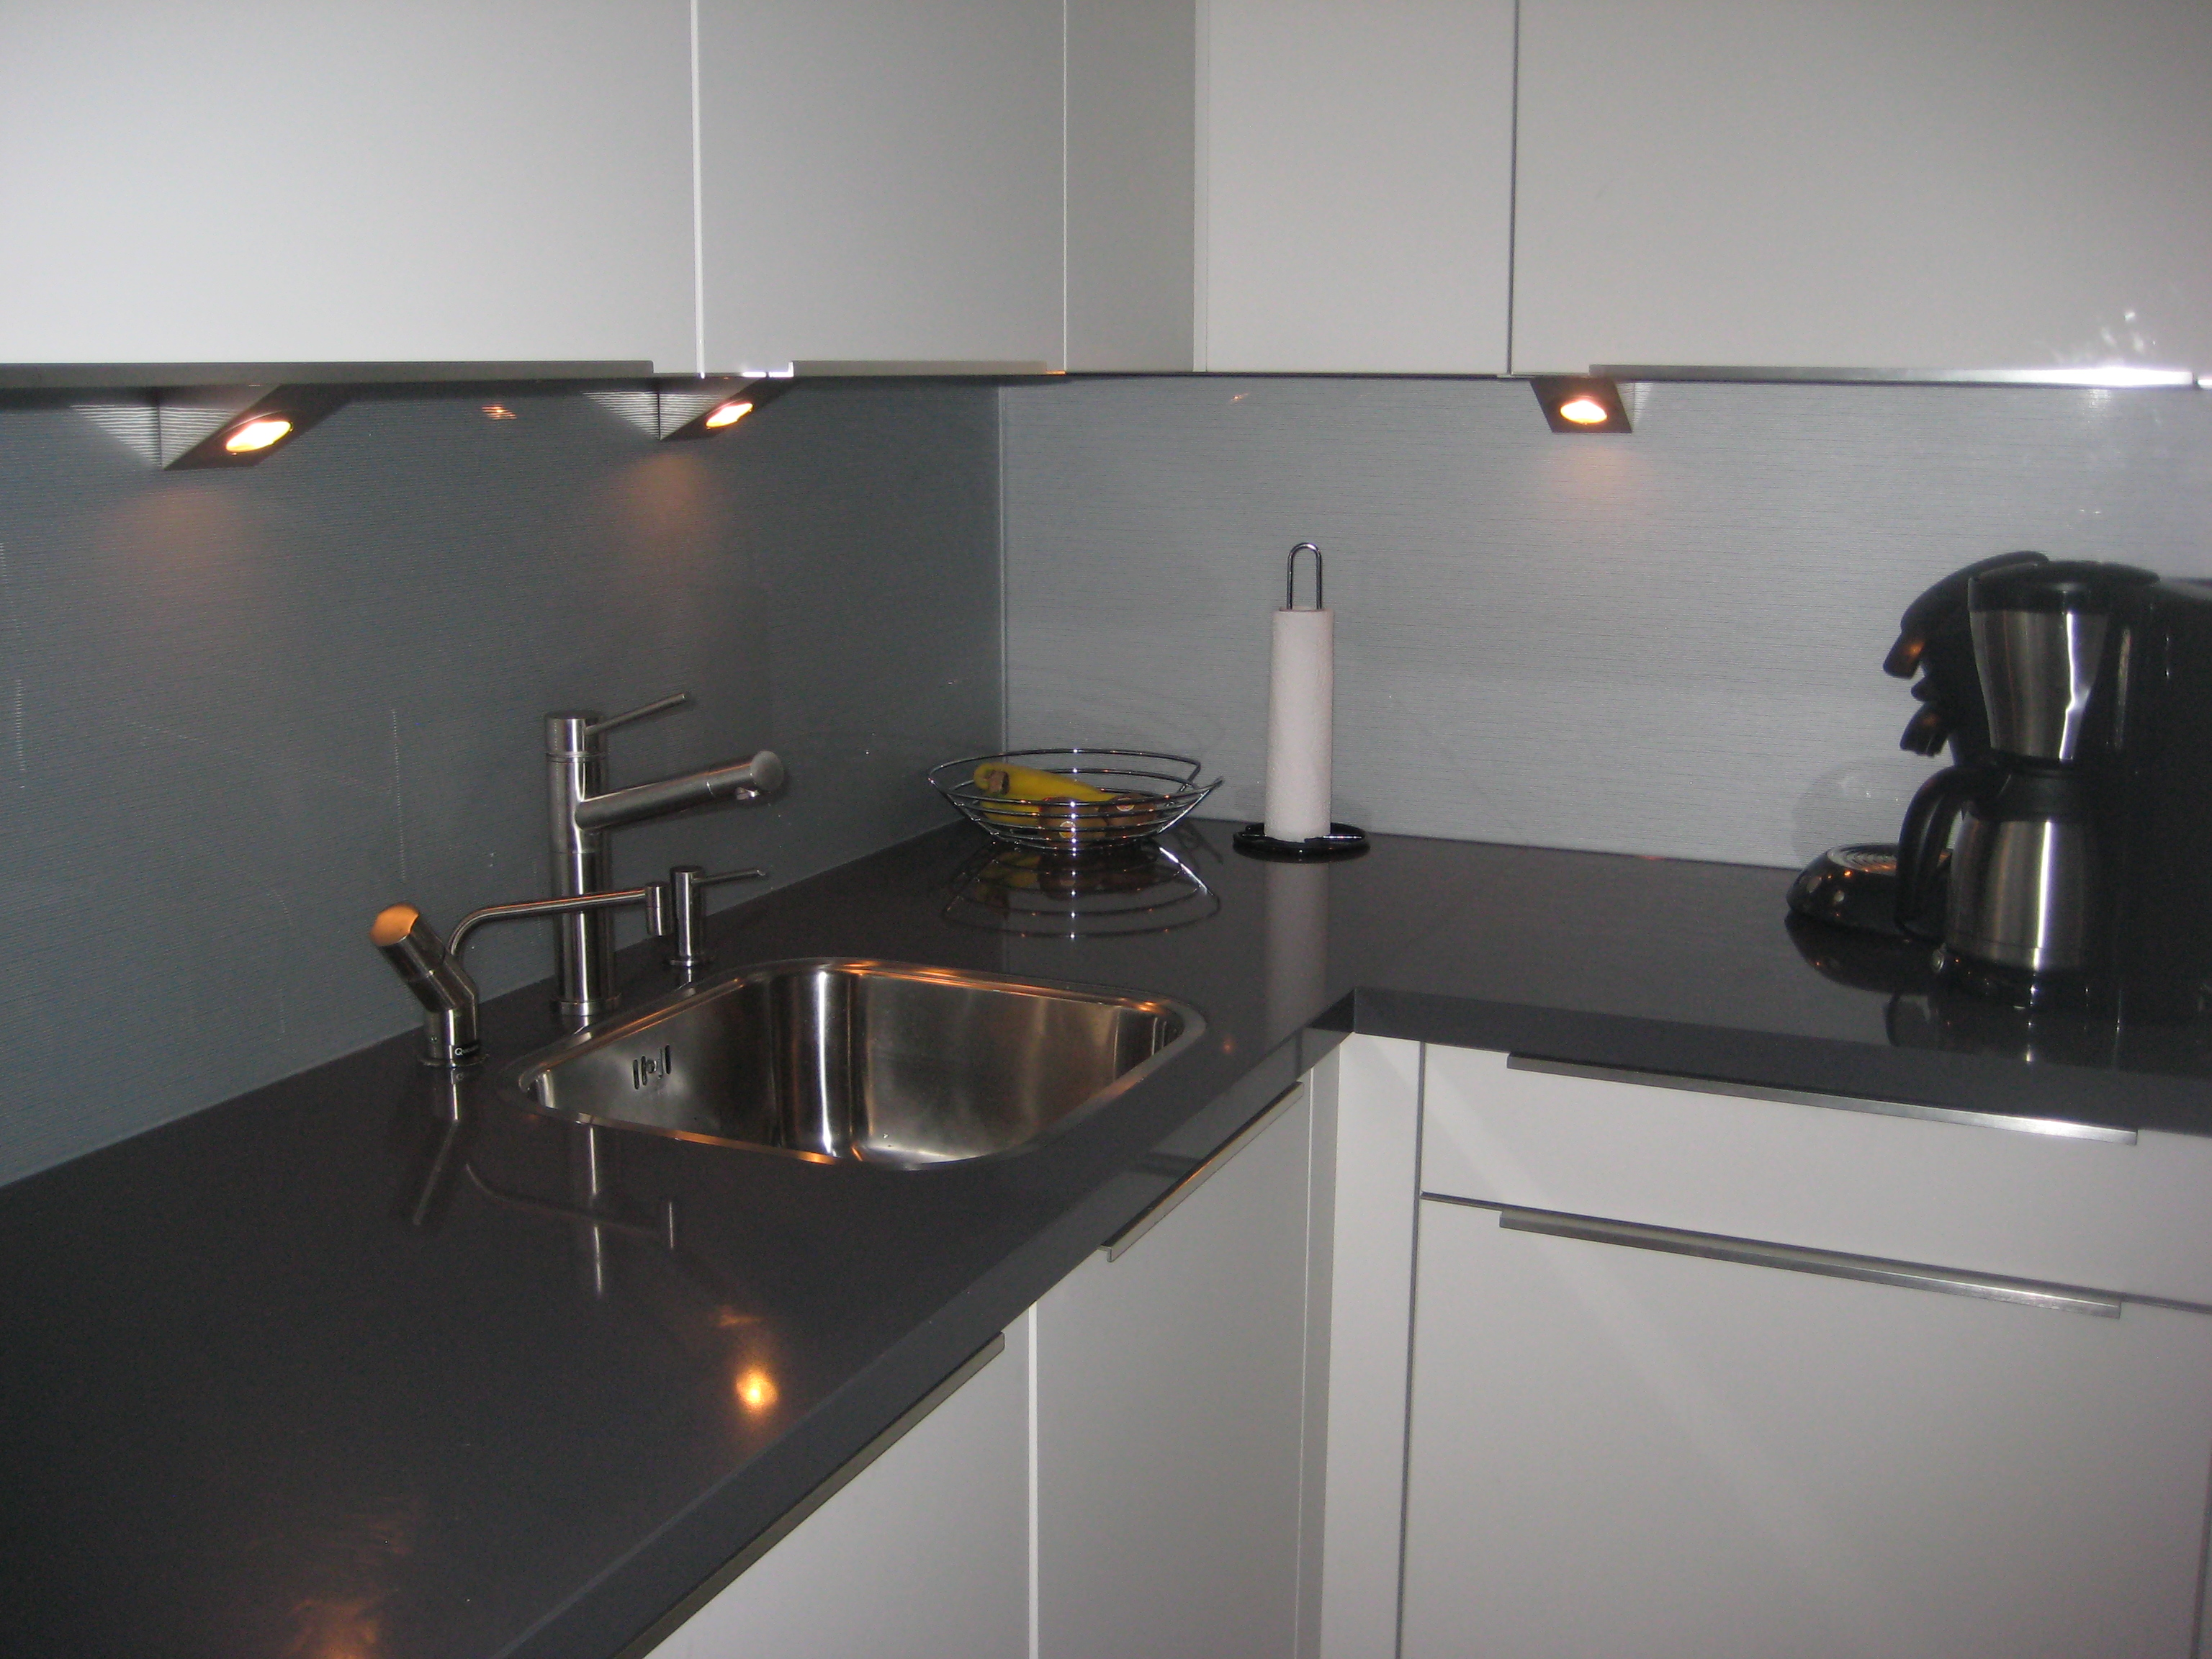 Grando Keukens Amsterdam : Keuken referentieklant van x grando keukens & bad zaandam